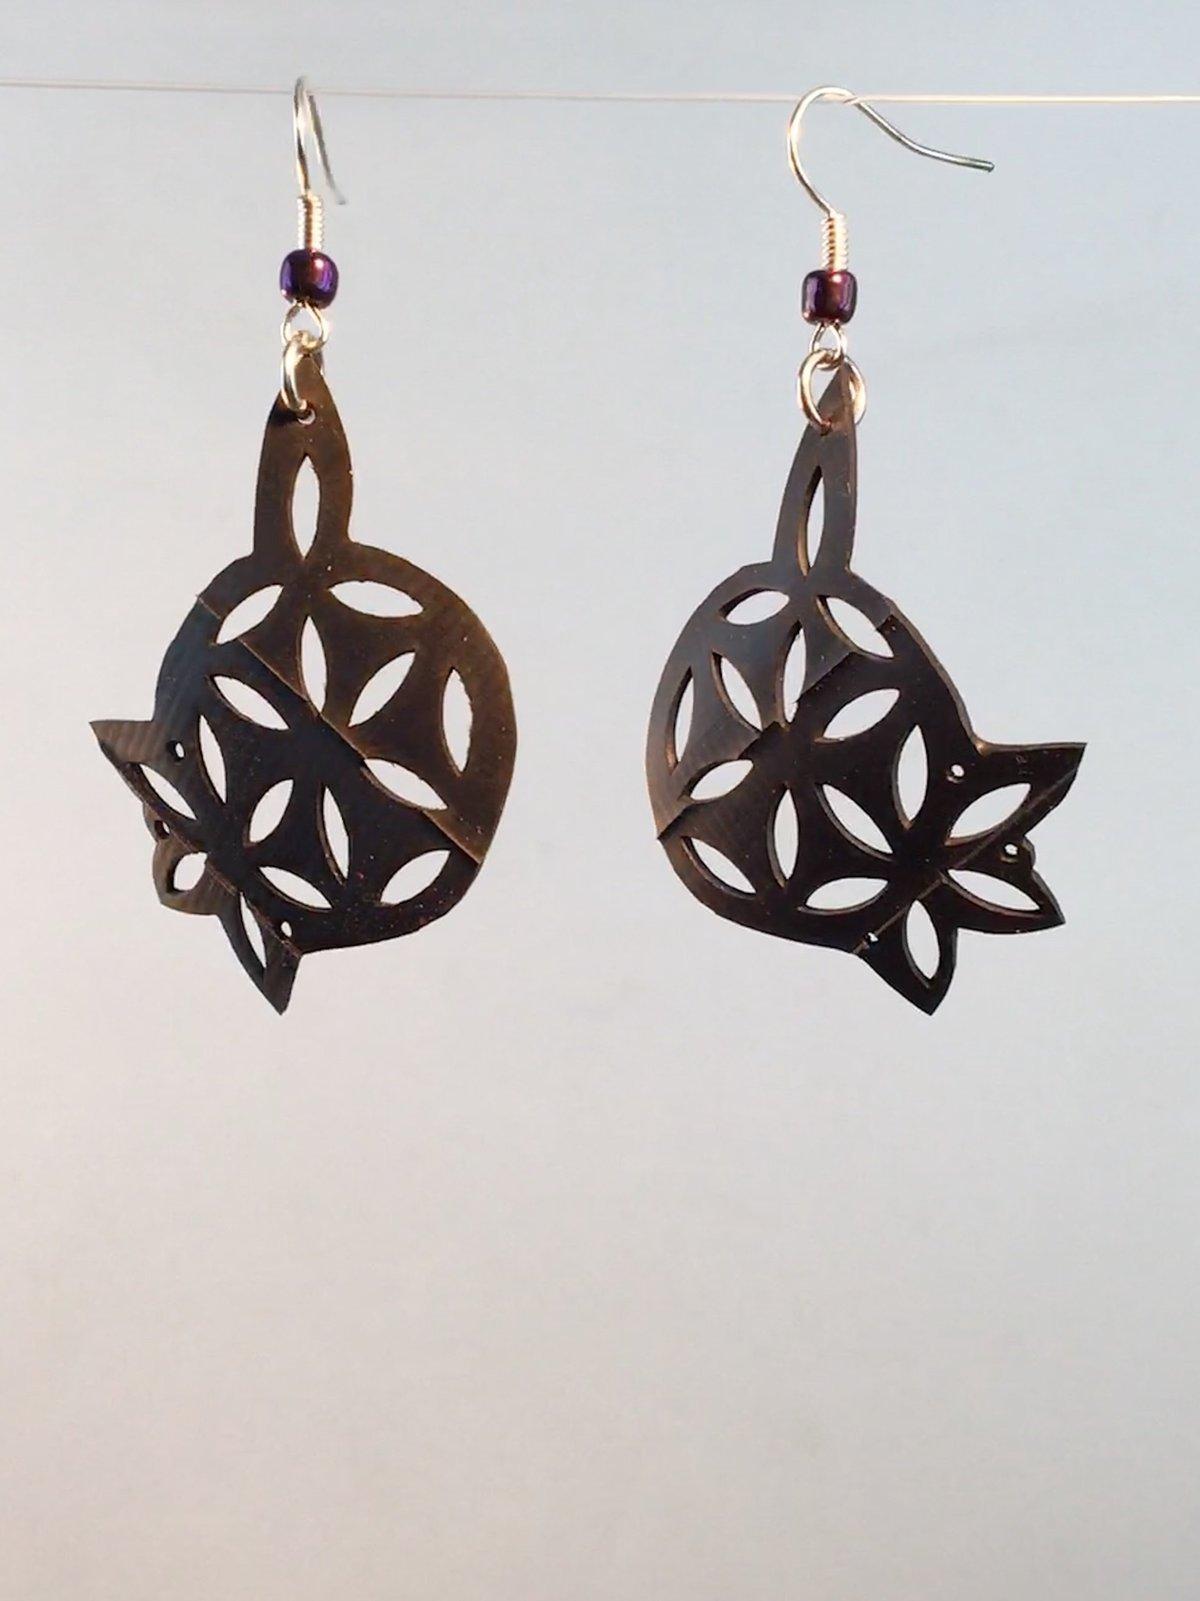 Mandala Sprout Sacred Geometry Bike Inner Tube Earrings